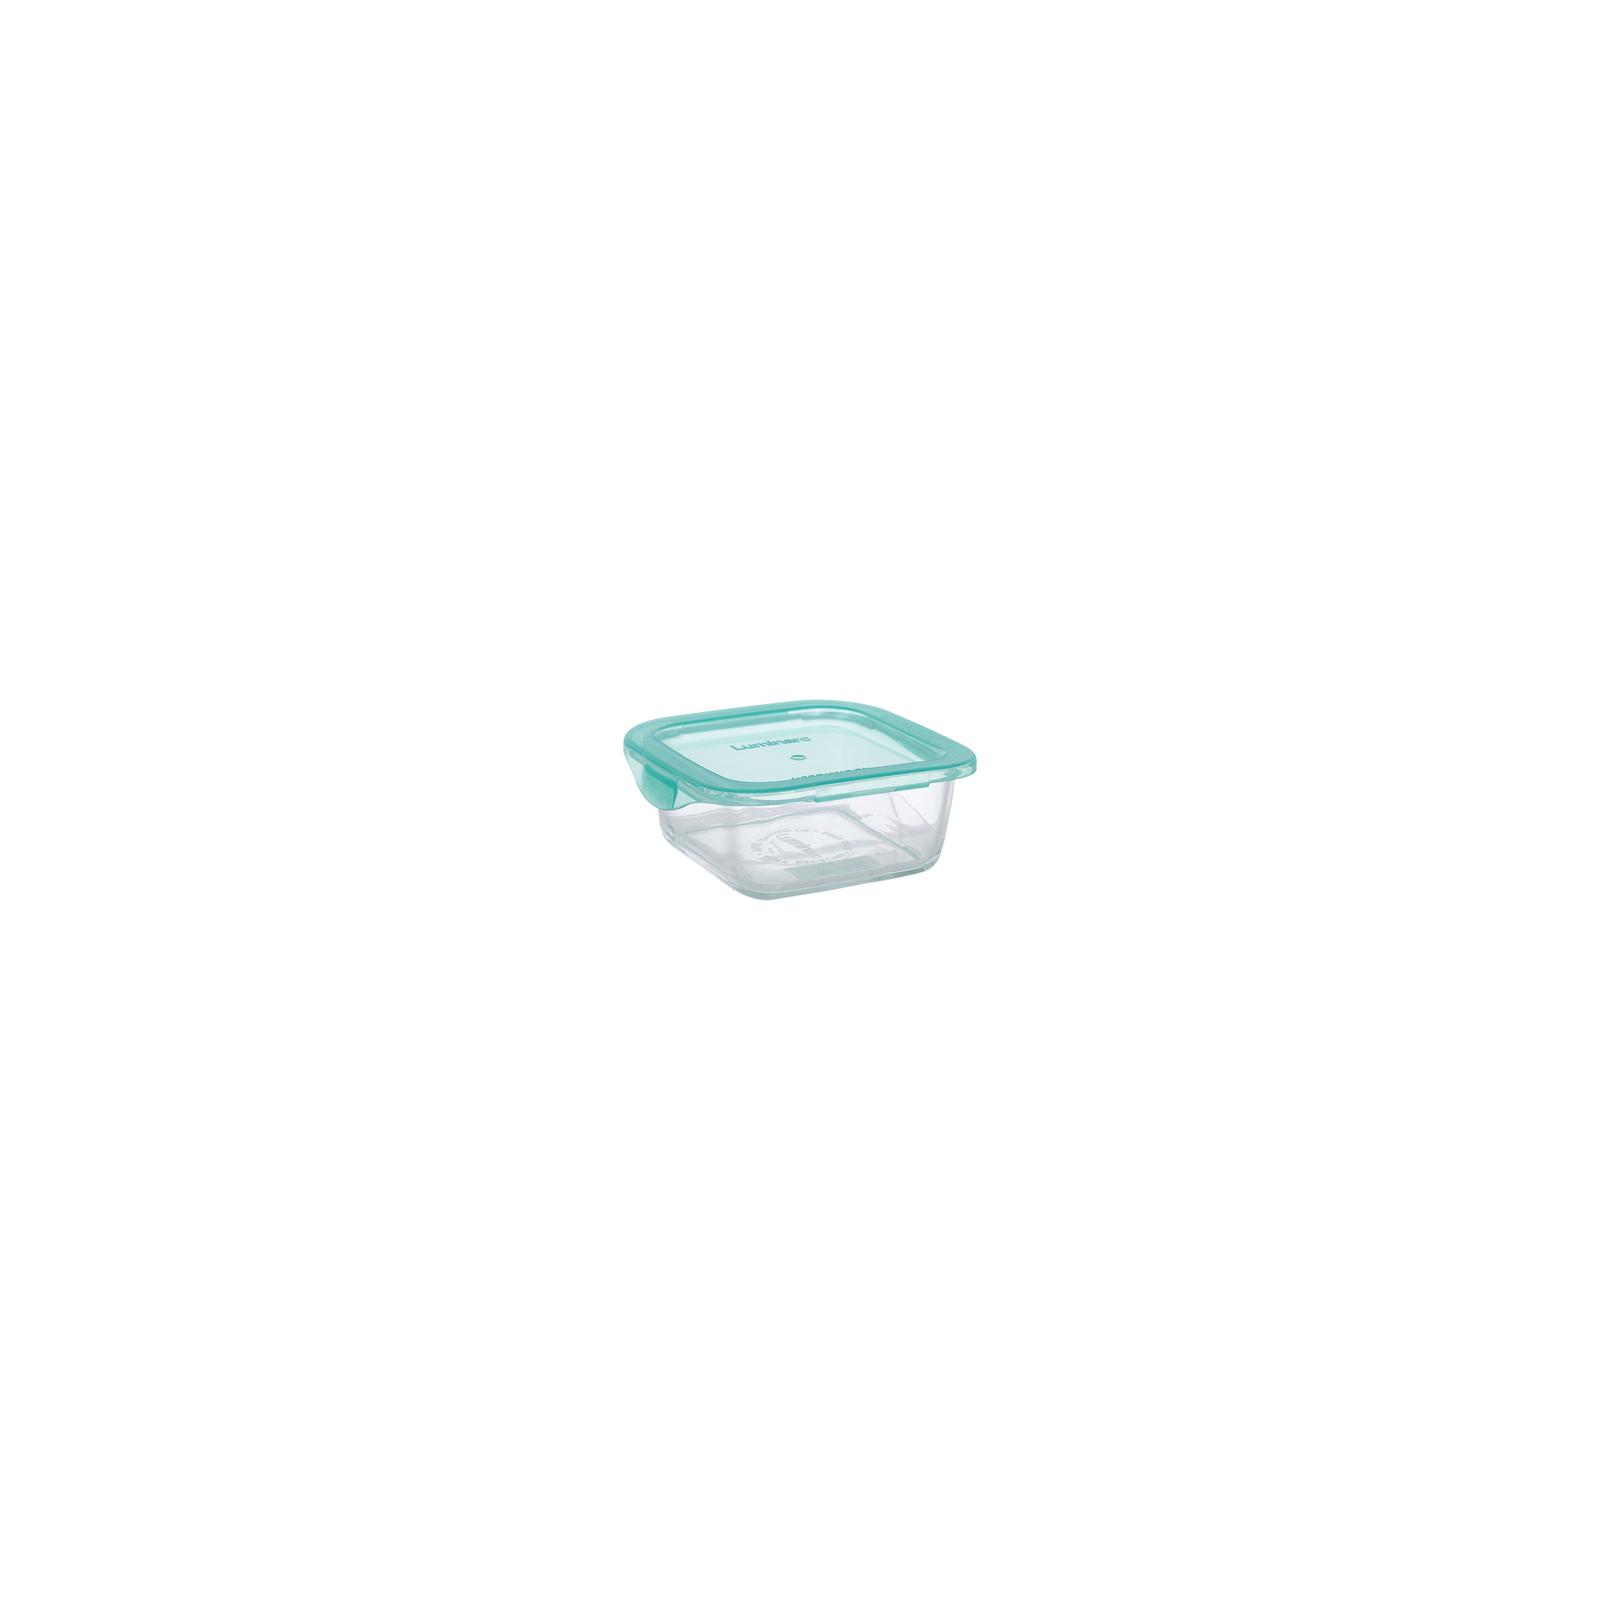 Пищевой контейнер Luminarc Keep'n Box Lagoon квадр. 380 мл (P5522)